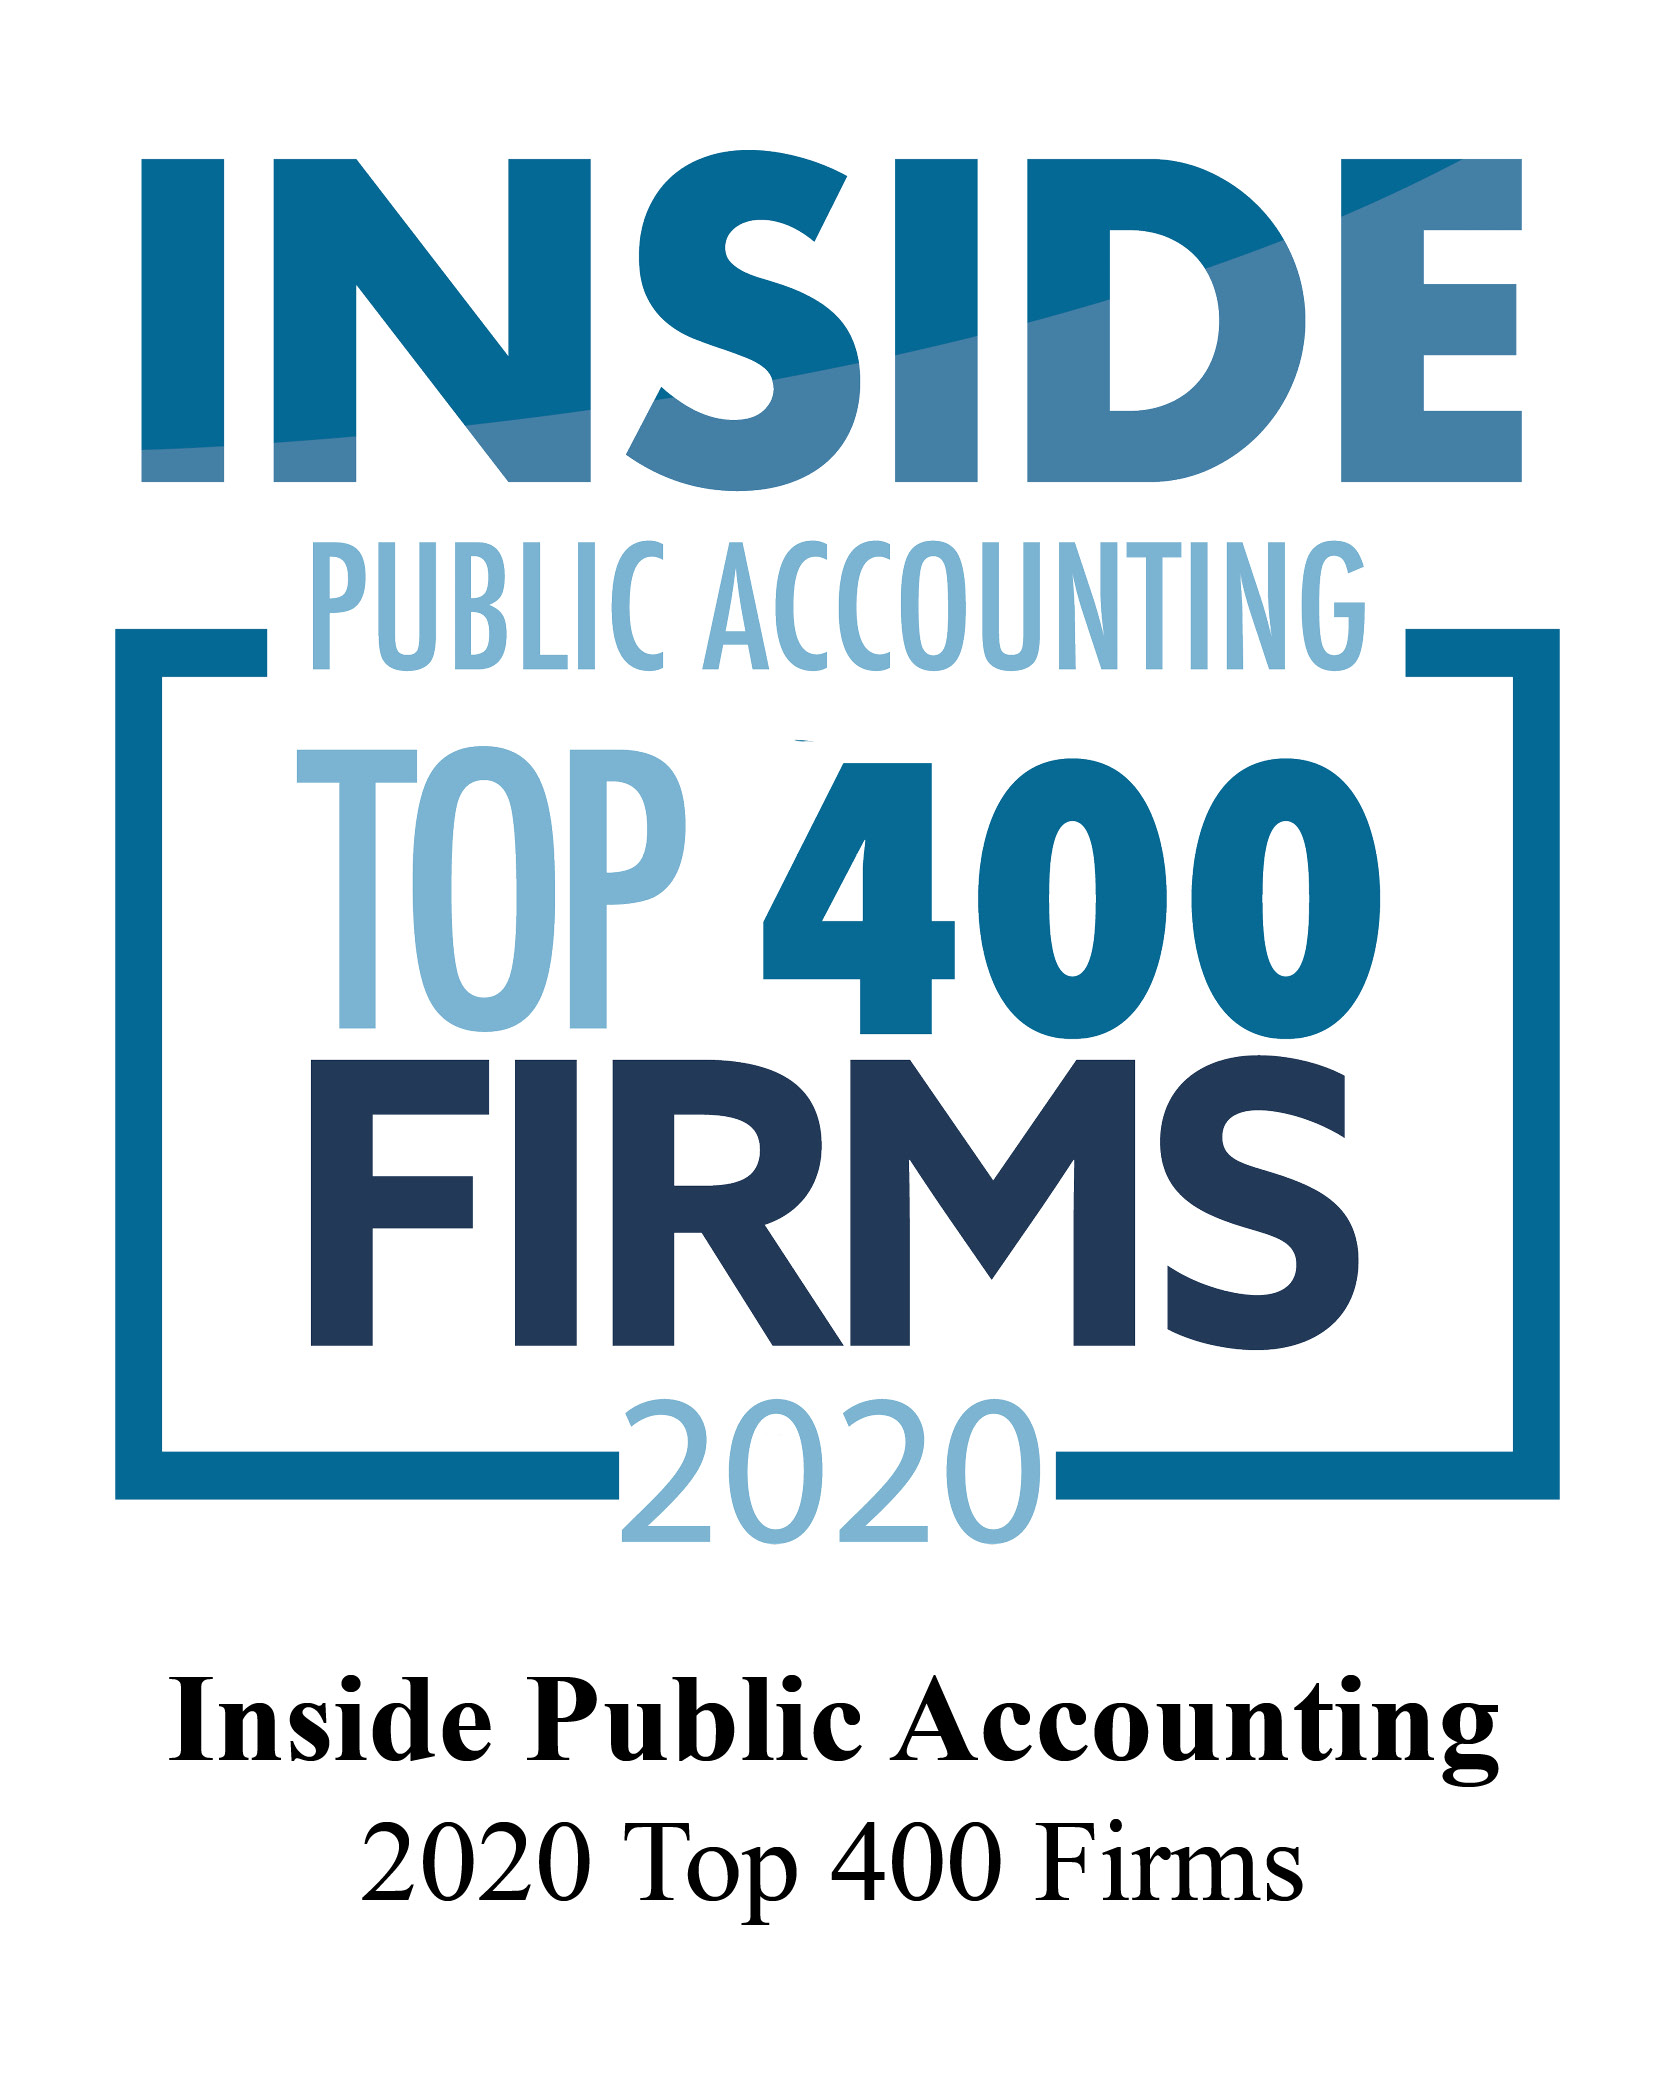 Inside Public Accounting 2020